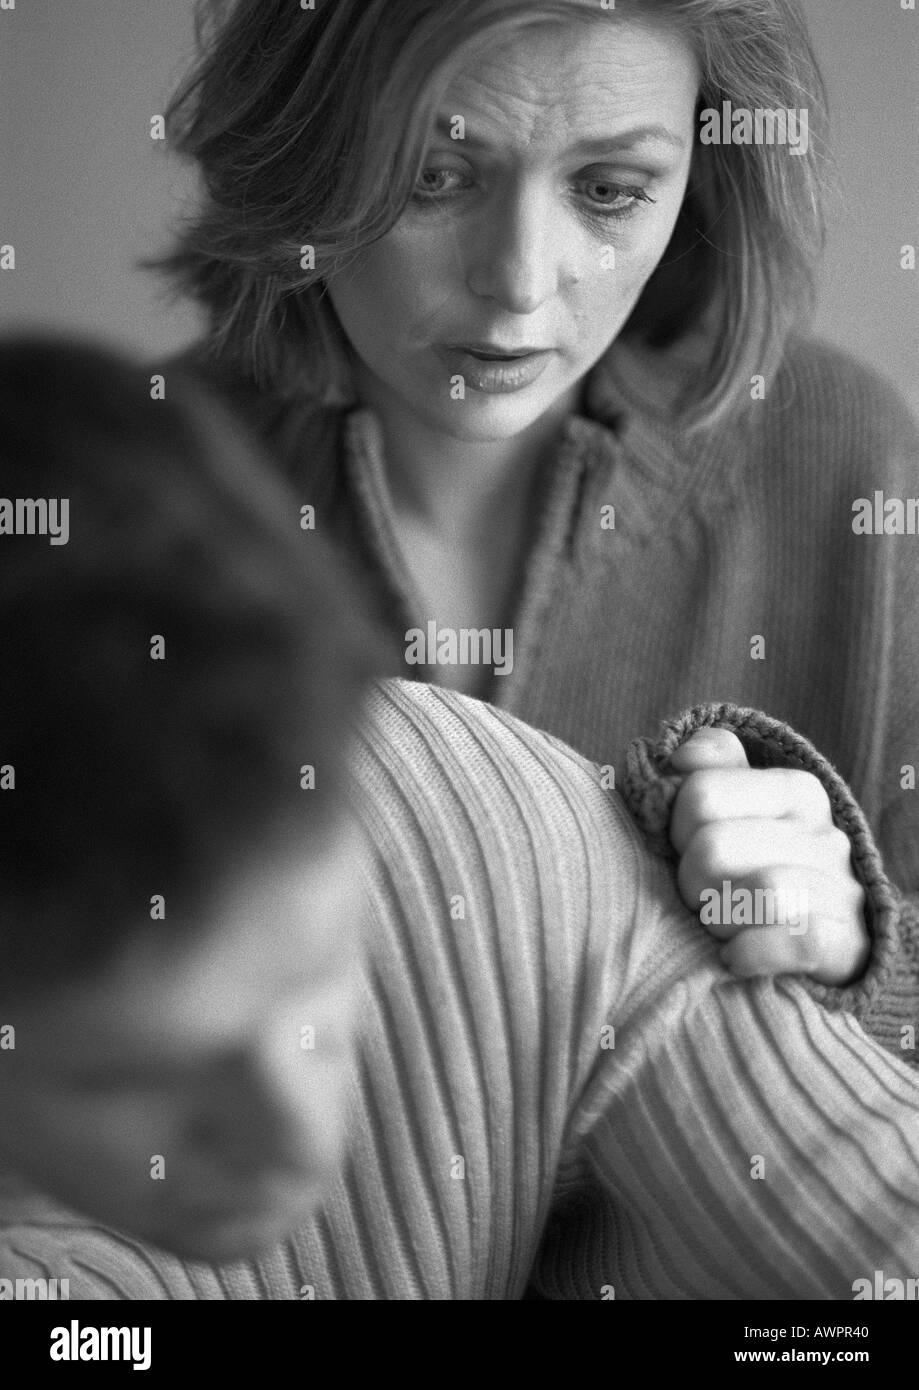 Woman touching man's arm, close-up, b&w - Stock Image